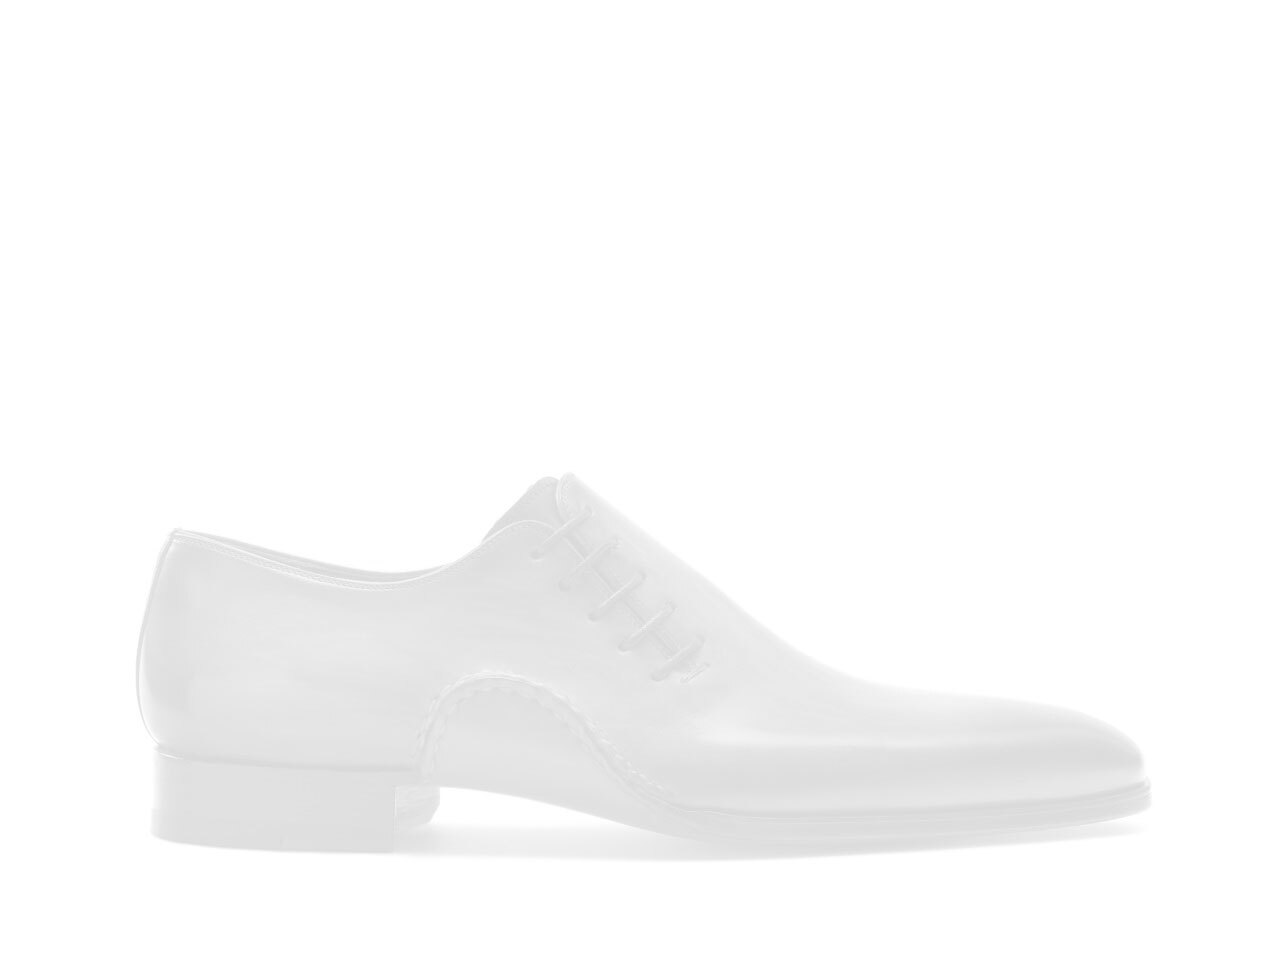 Sole of the Magnanni Brava Tinto Men's Sneakers